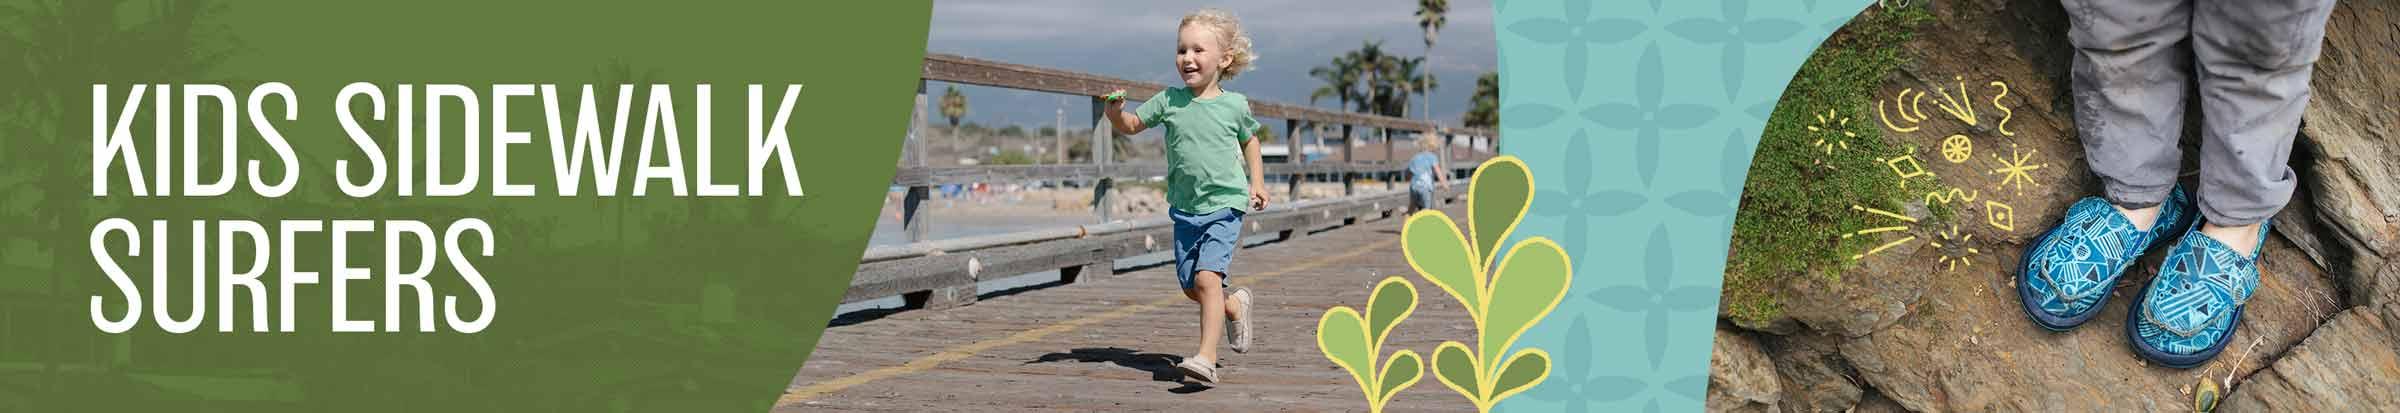 Kids Sidewalk Surfers